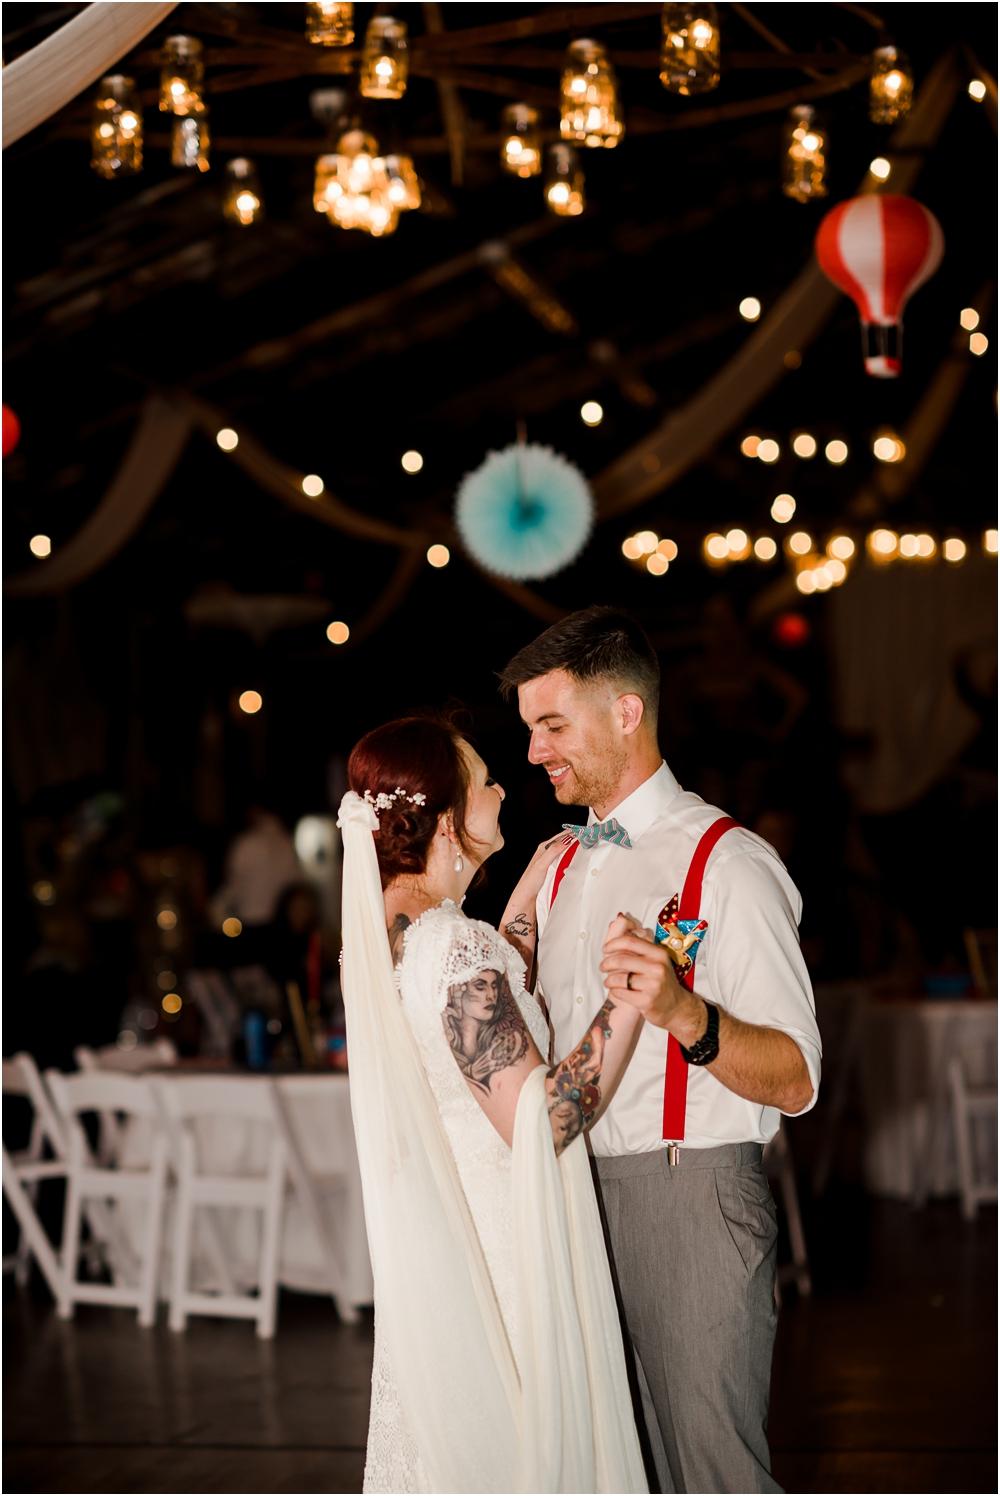 the-barn-at-wateroaks-circus-florida-wedding-photographer-kiersten-stevenson-photography-115.jpg